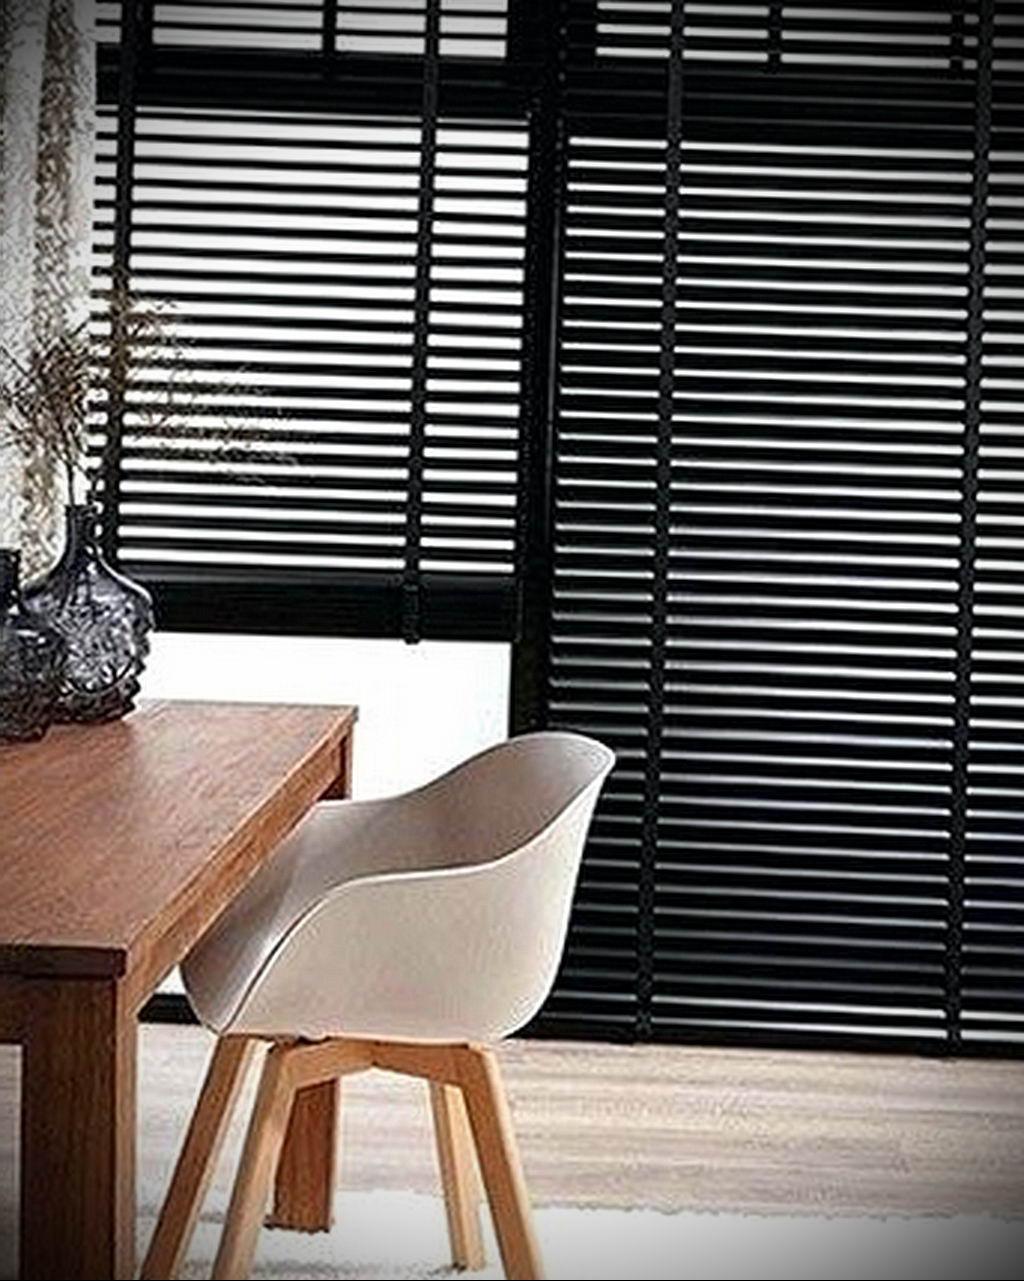 черные жалюзи в интерьере 19.09.2019 №063 - black blinds in the interior - design-foto.ru